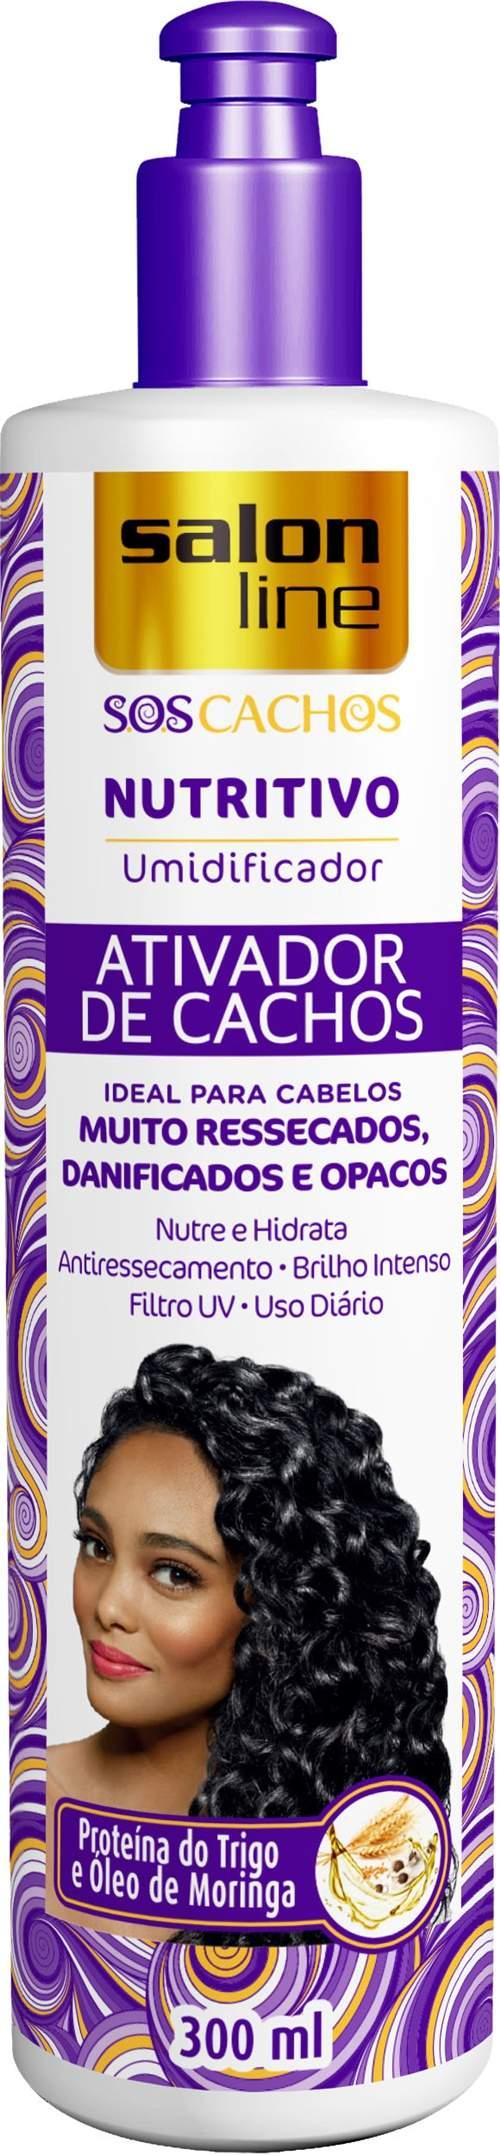 ATIVADOR DE CACHOS SALON LINE – UMIDIFICADOR NUTRITIVO - SALON LINE